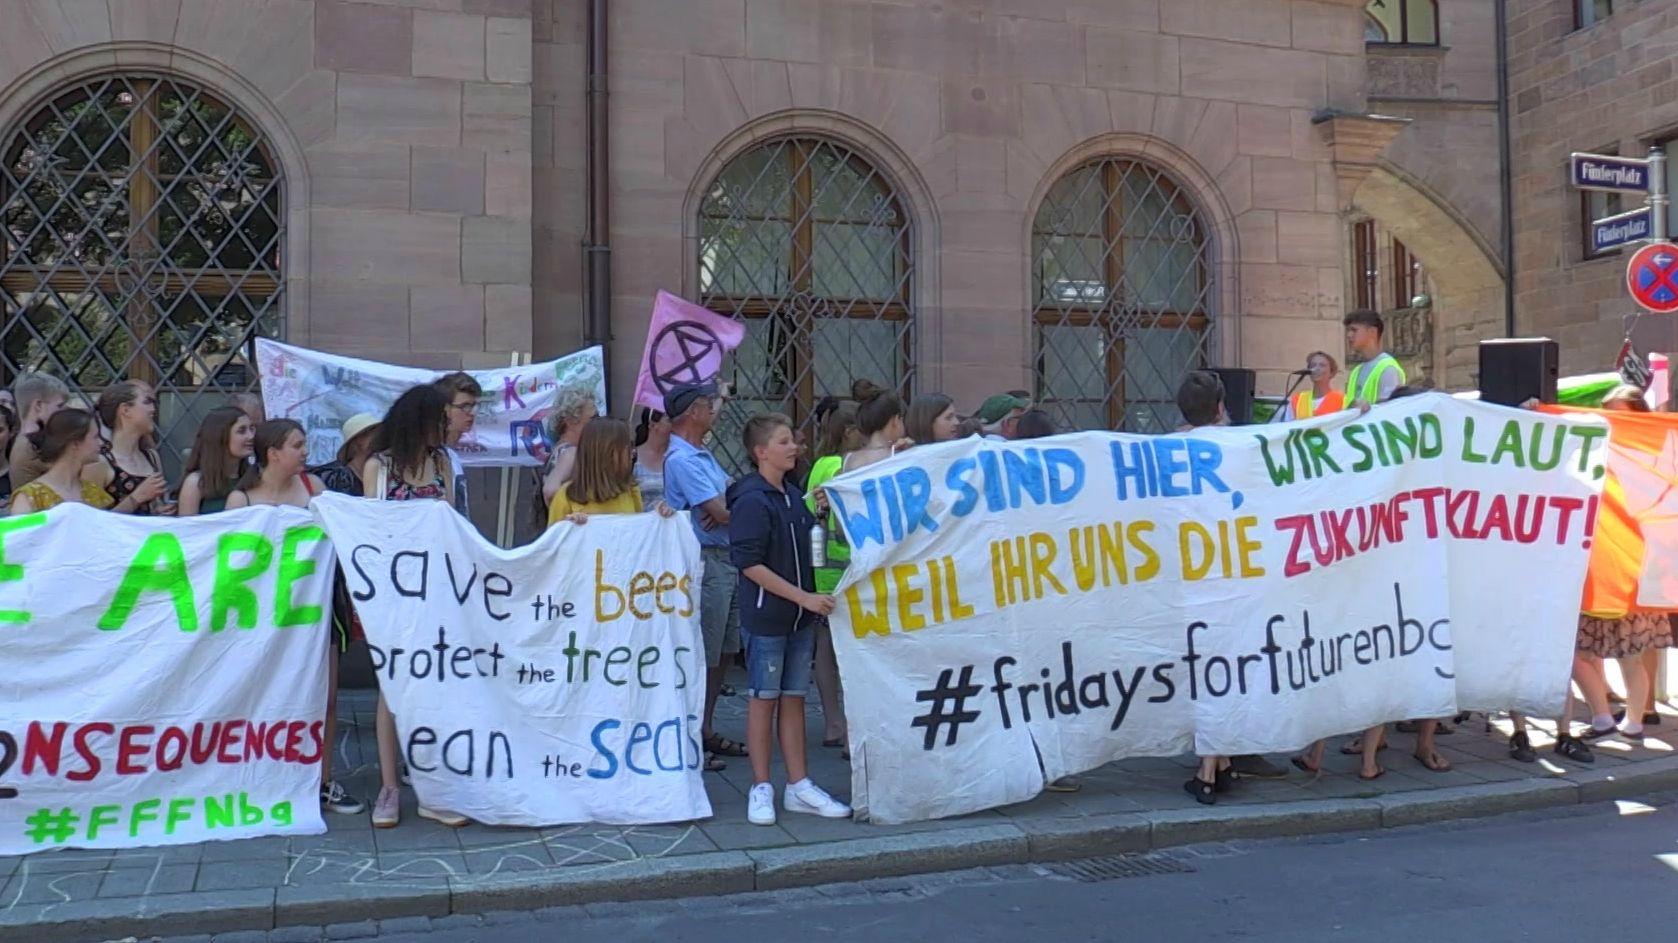 Fridays-for-Future-Aktivisten demonstrierten vor dem Rathaus in Nürnberg